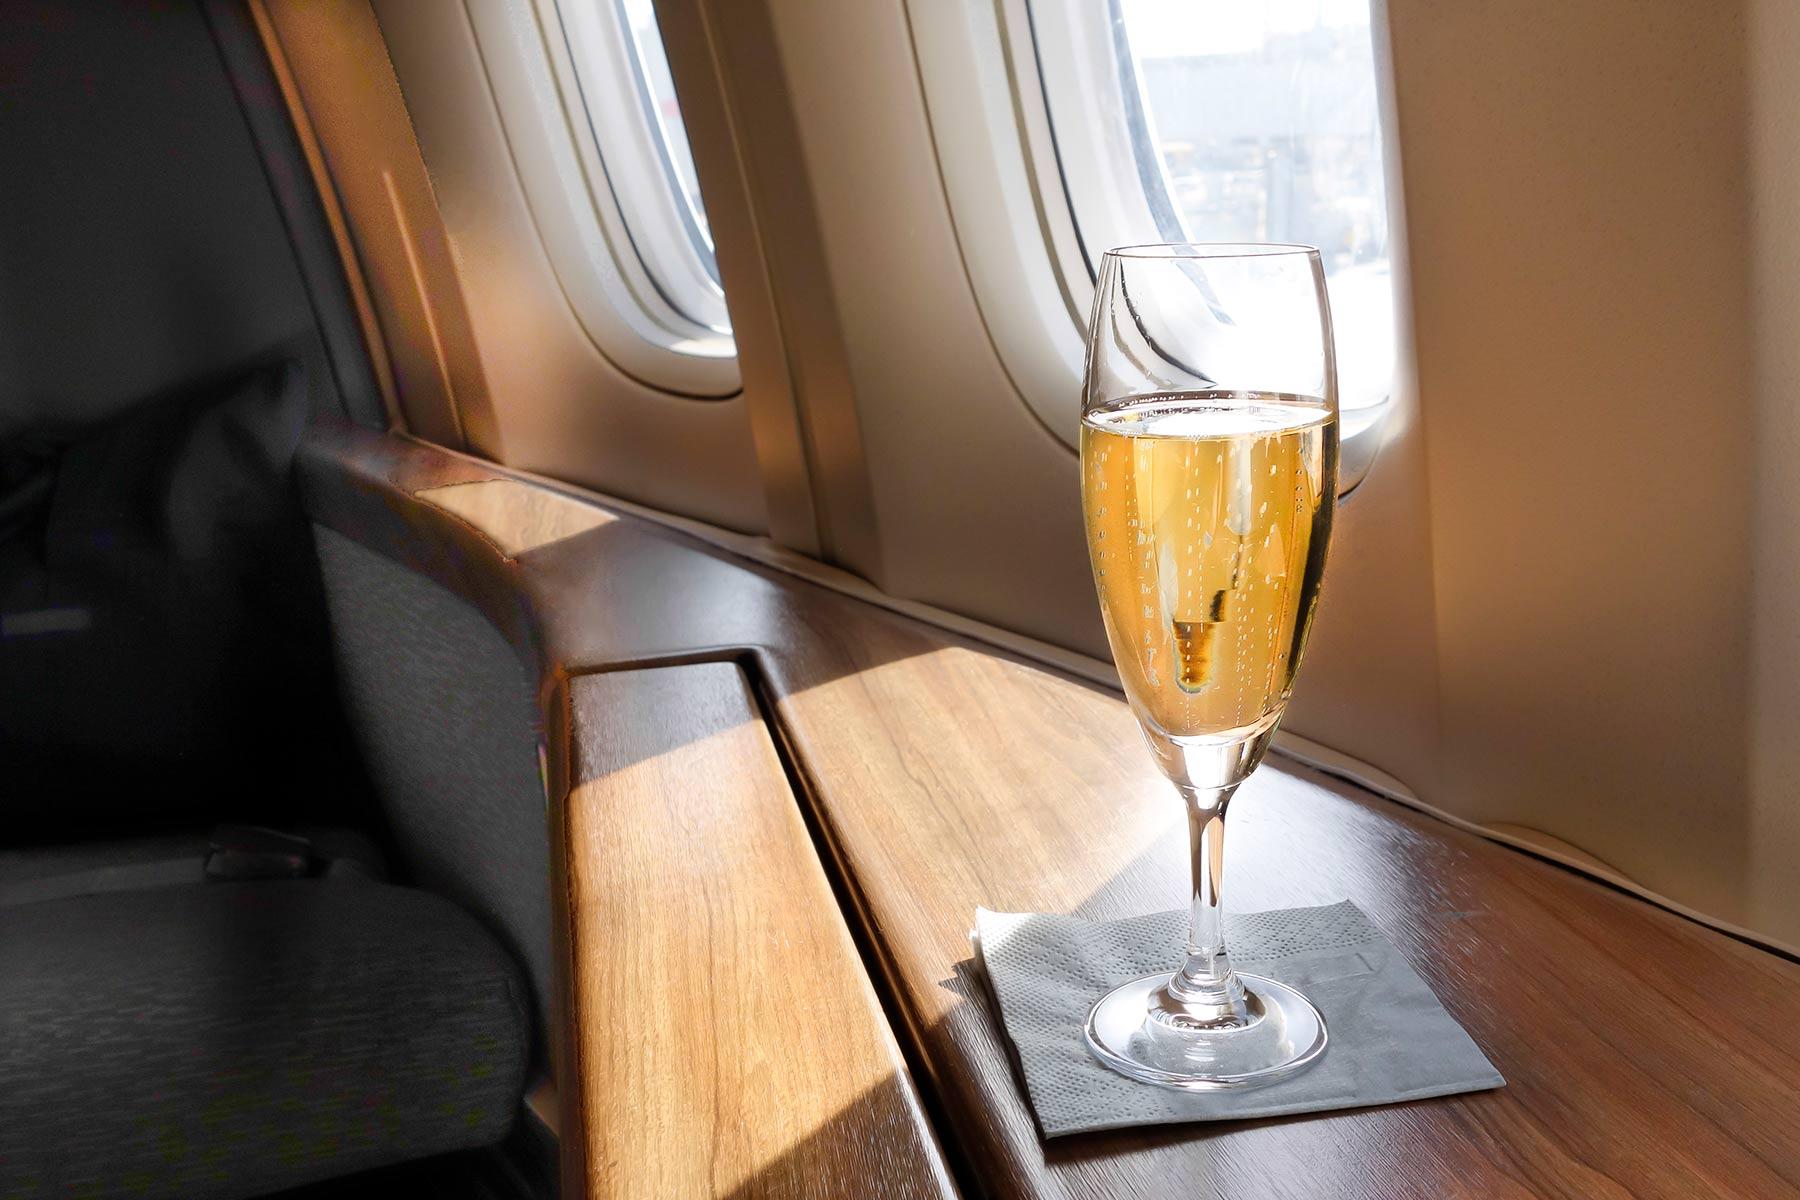 Bar service aboard a Gulfstream private jet aircraft